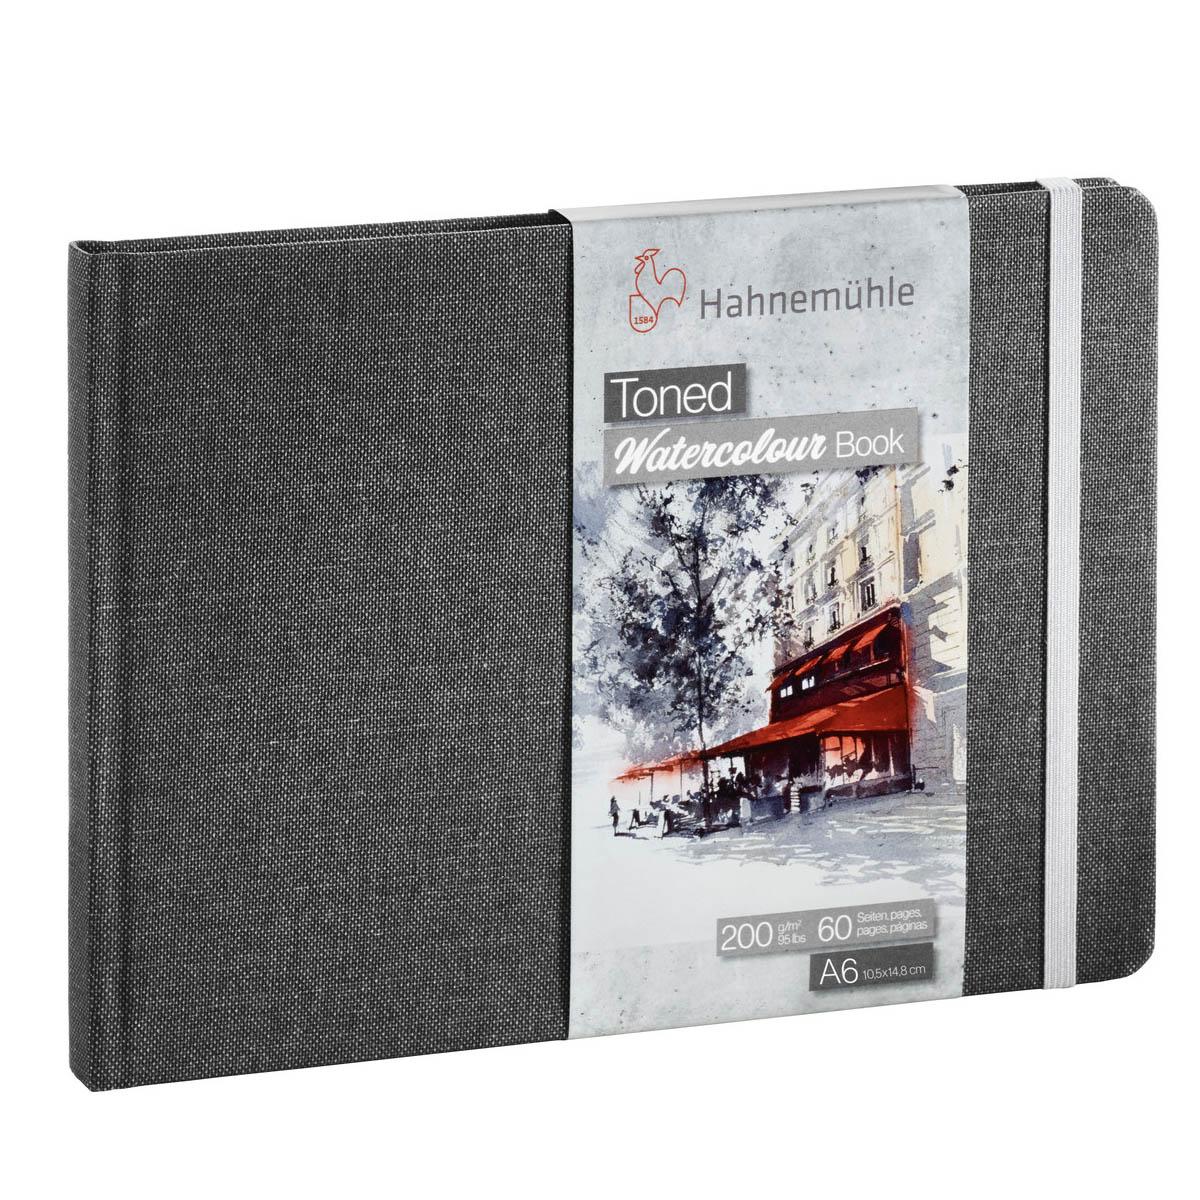 TONED WATERCOLOUR BOOK CINZA 200g A6 30fl 10625170